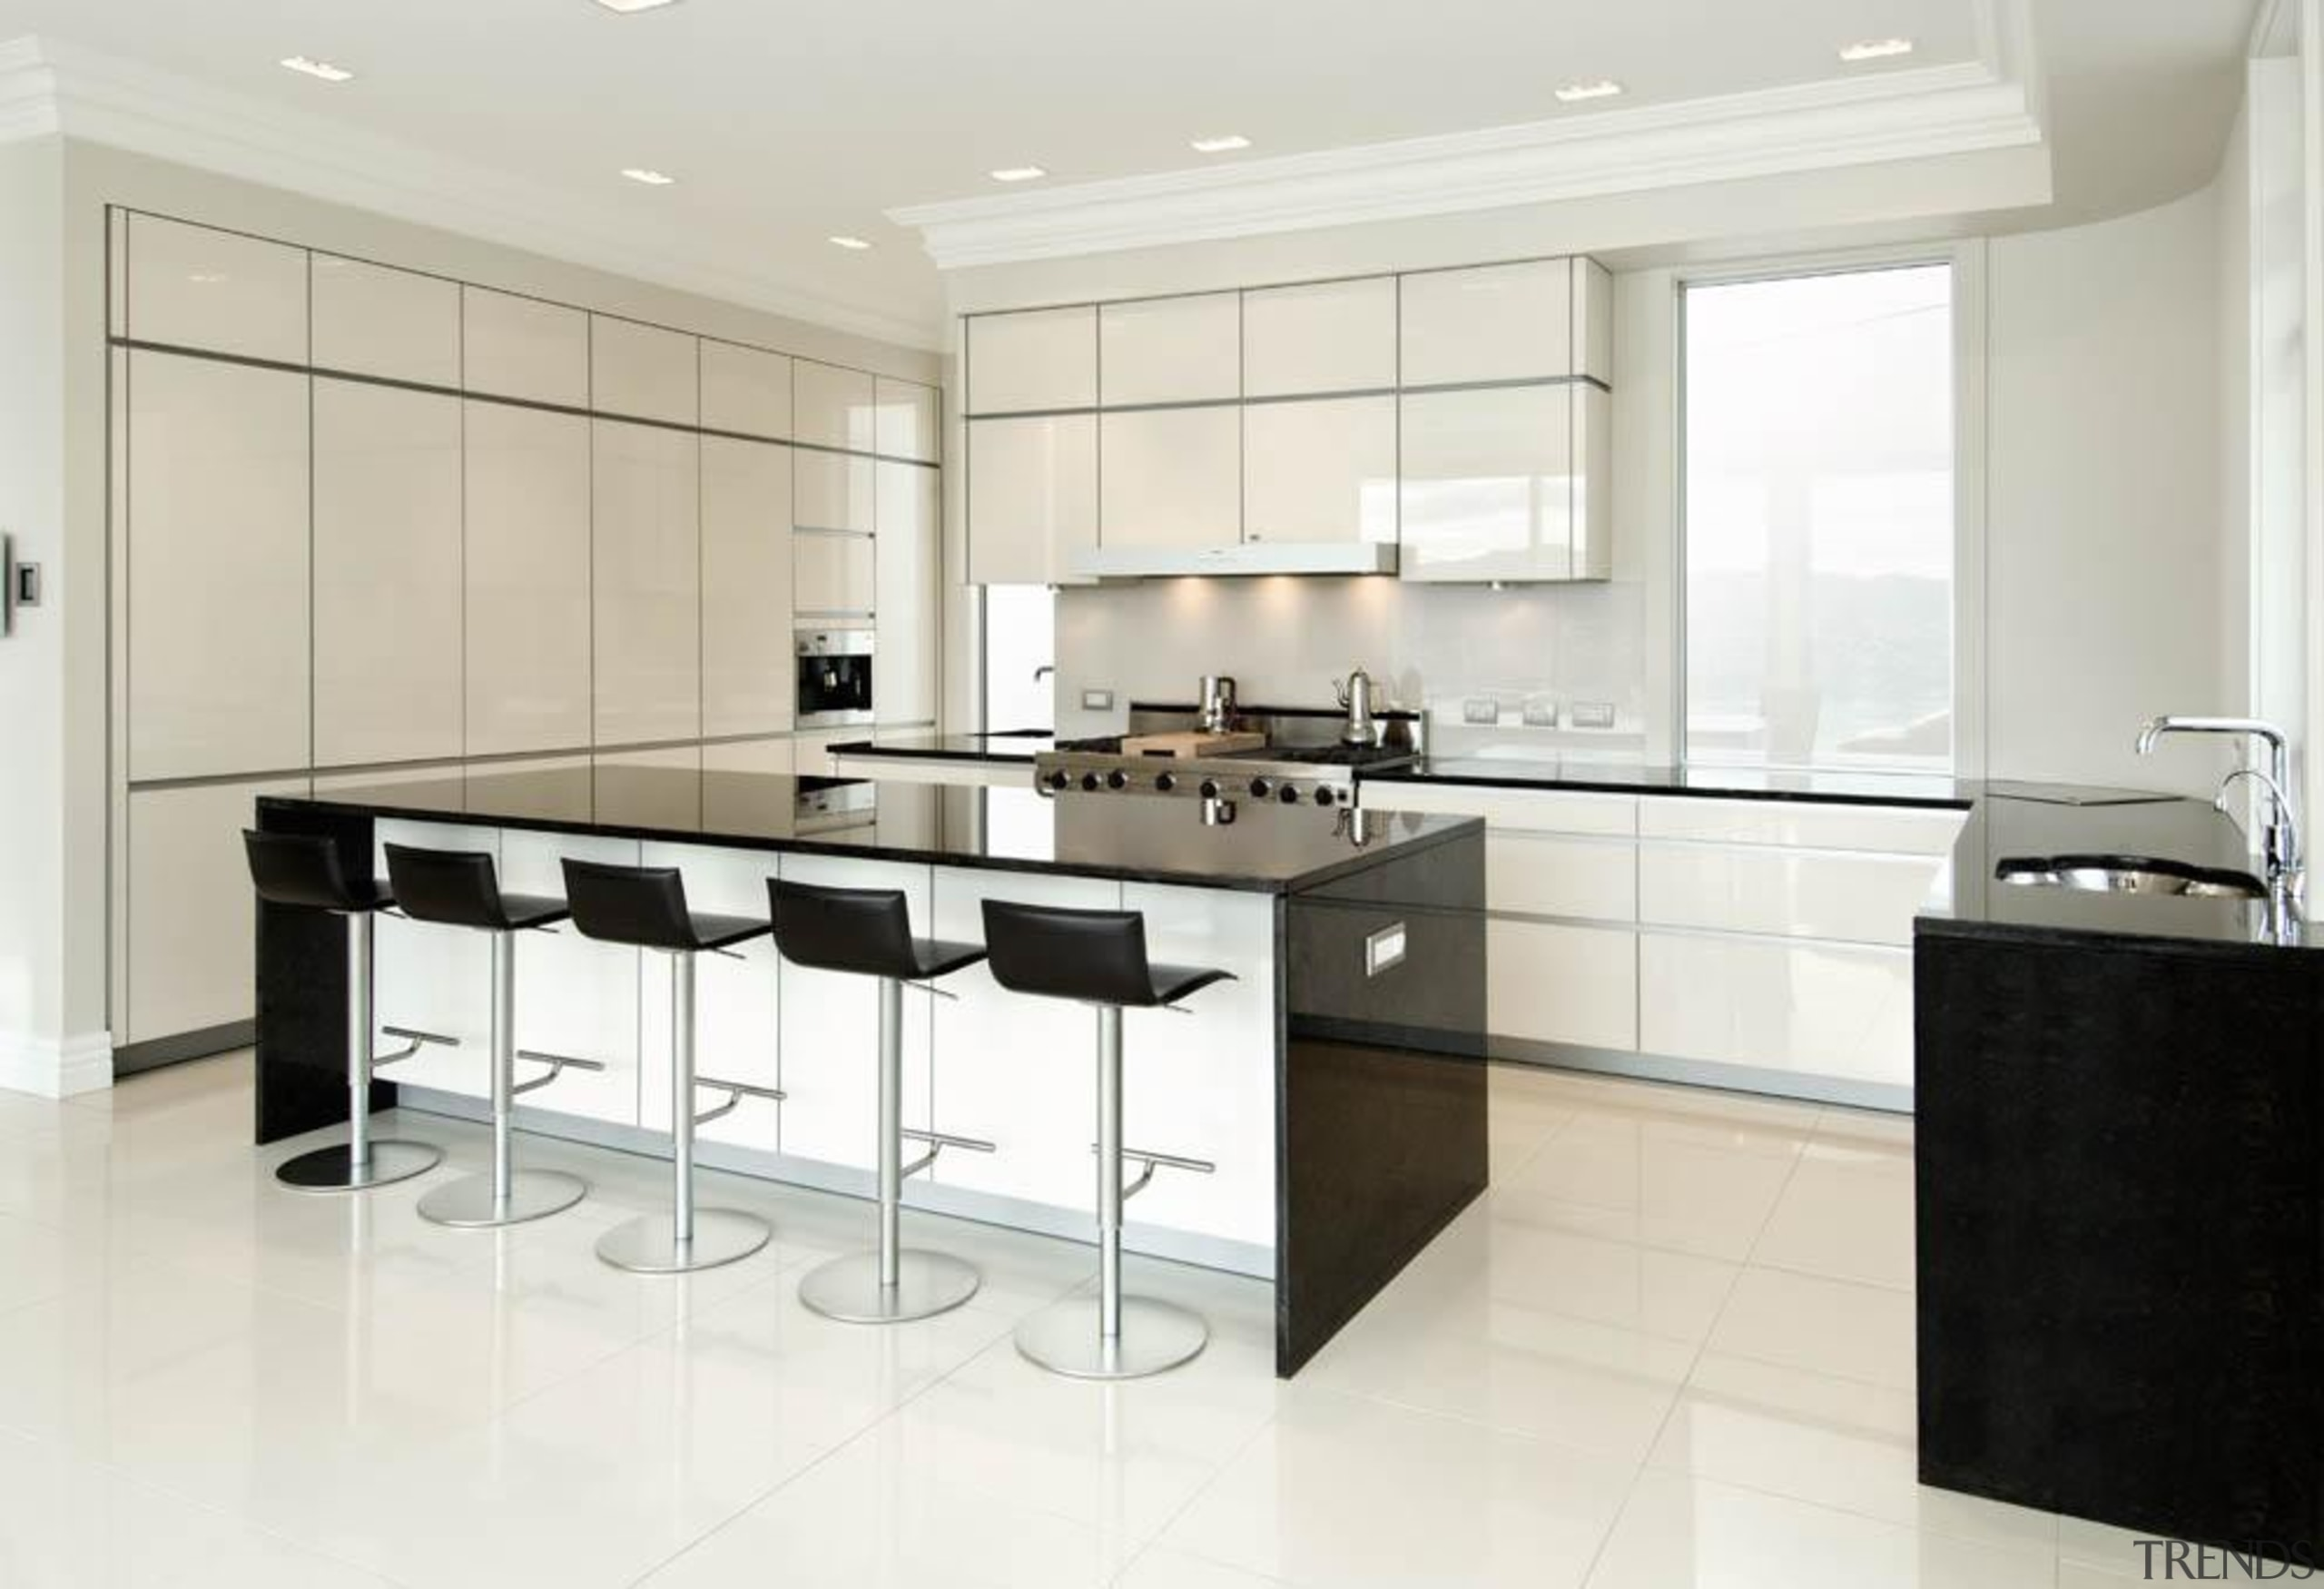 Wellington Kitchen of the Year 2010 - Wellington cabinetry, countertop, cuisine classique, floor, flooring, interior design, kitchen, product design, property, room, tile, white